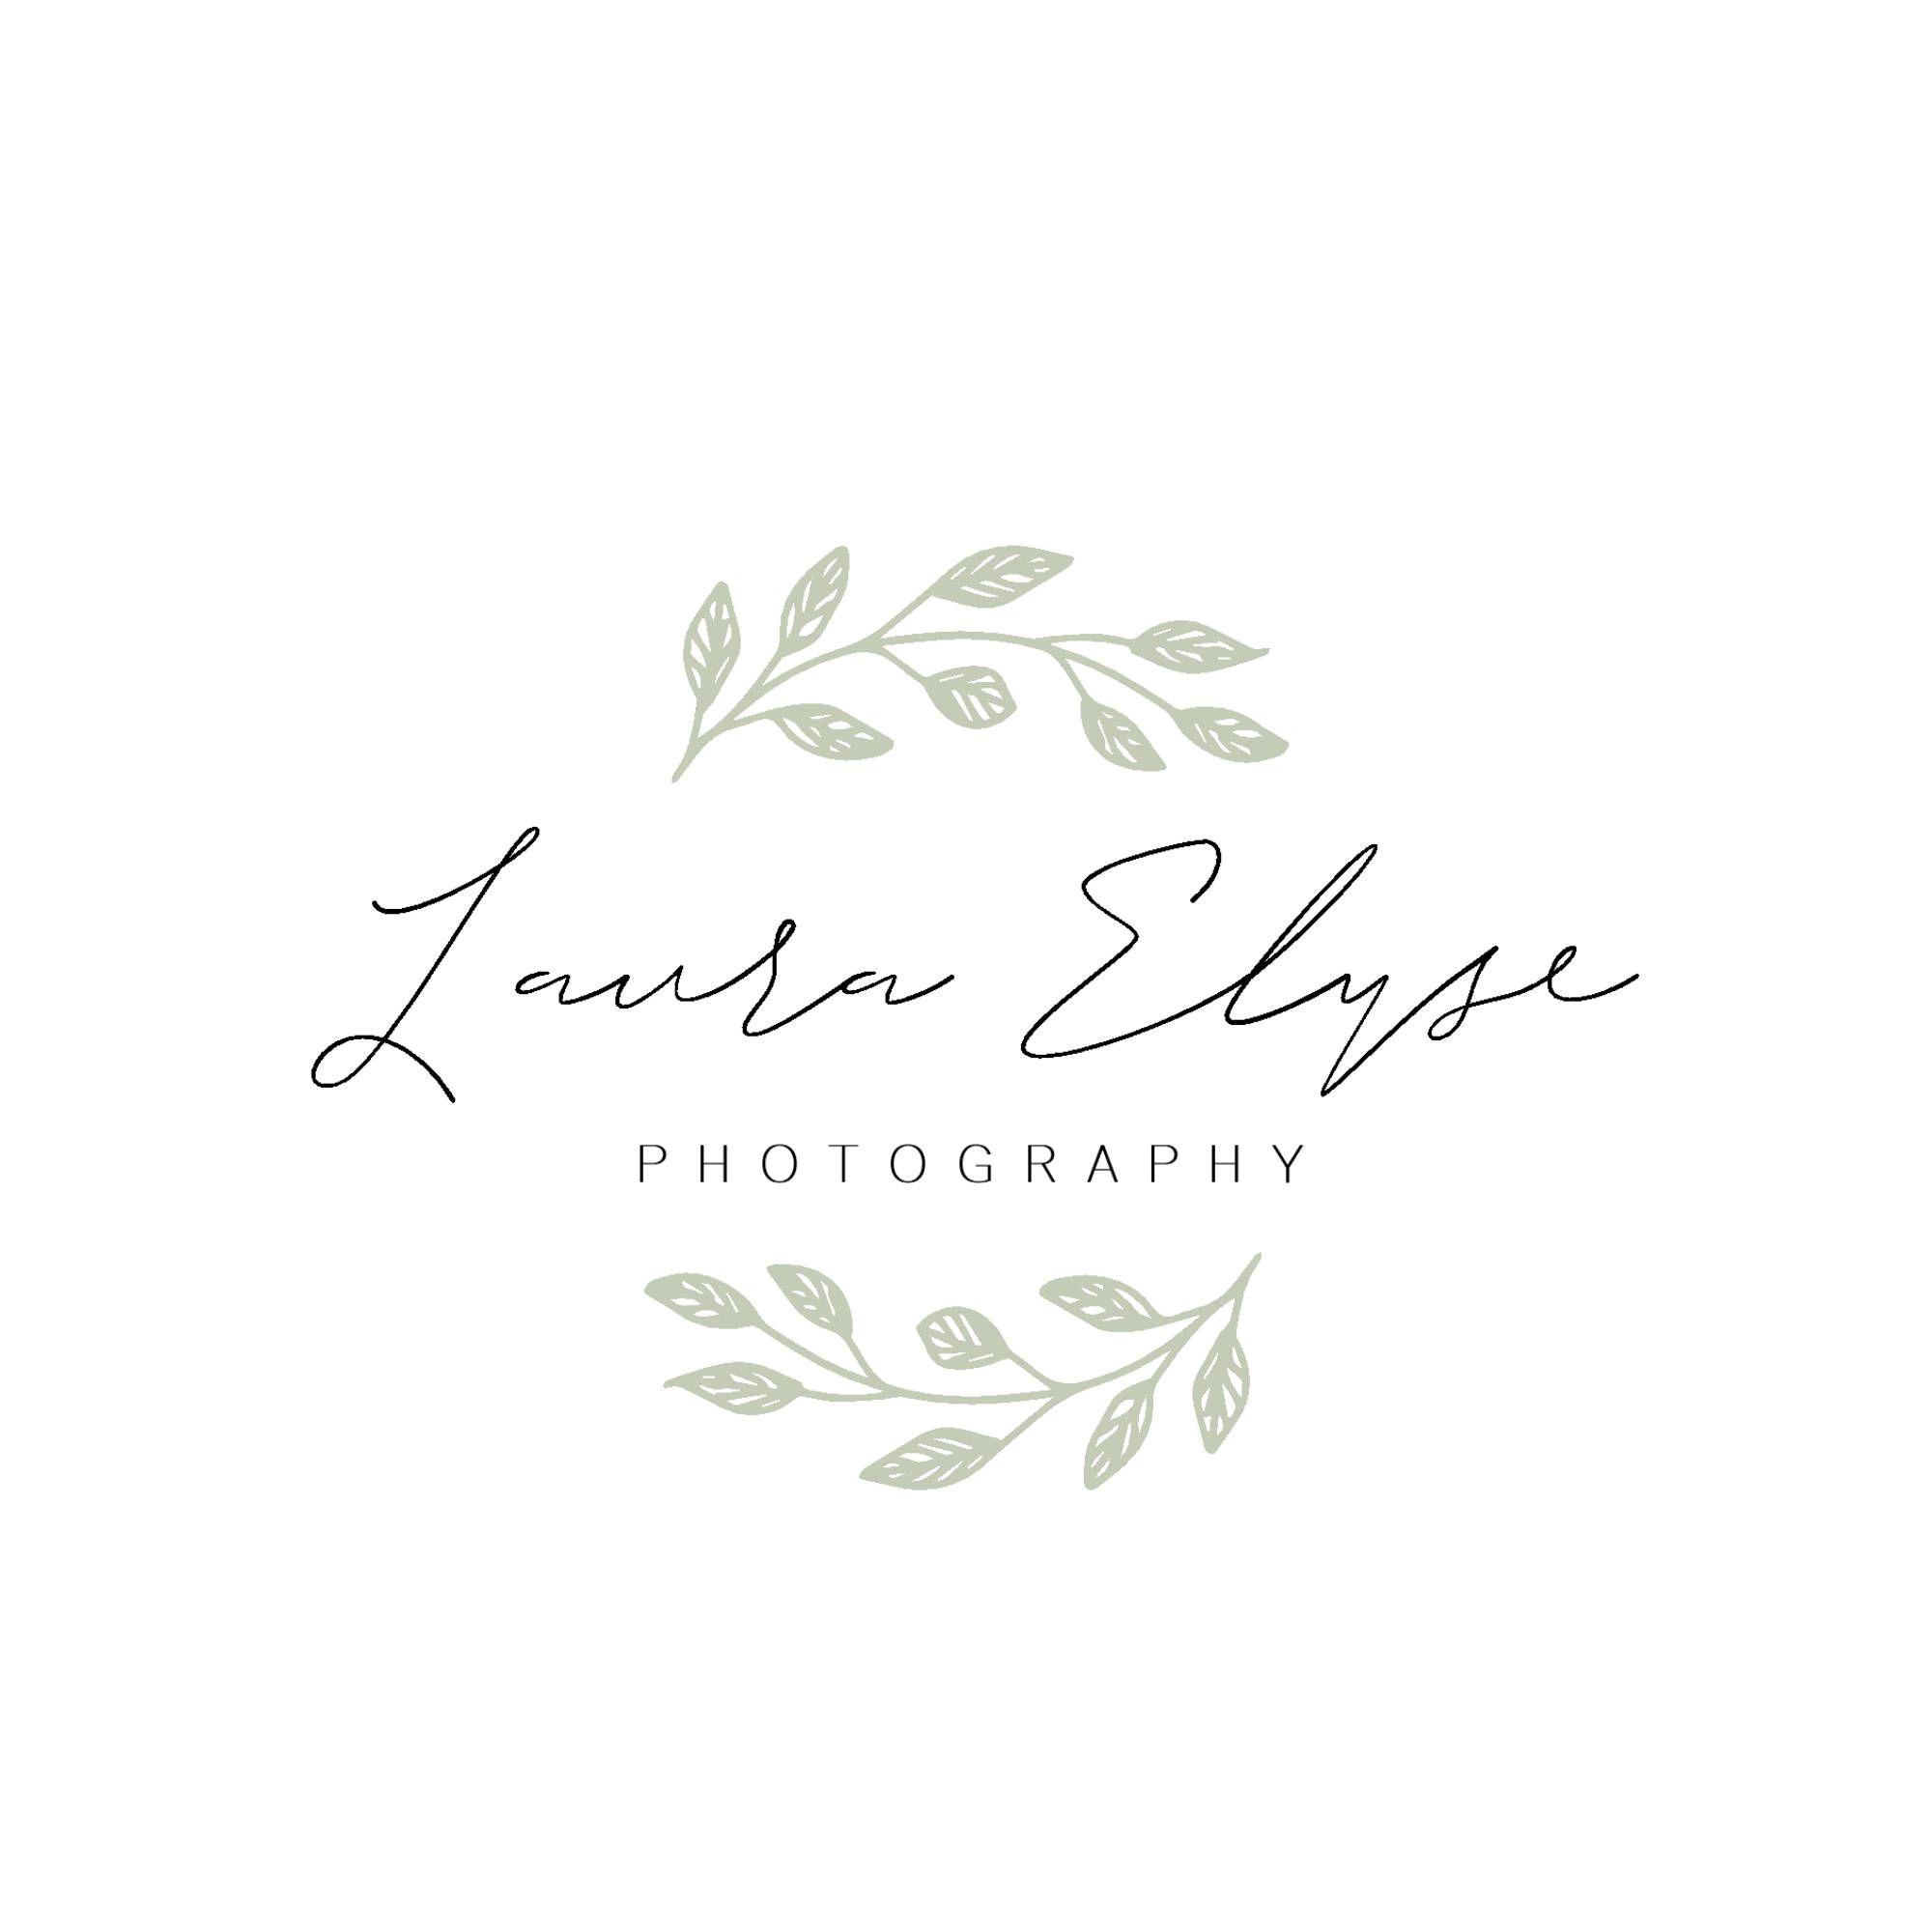 Leaf Logo Design Photography Branding Business Logo Design Etsy Photography Logo Design Photography Branding Business Logo Design